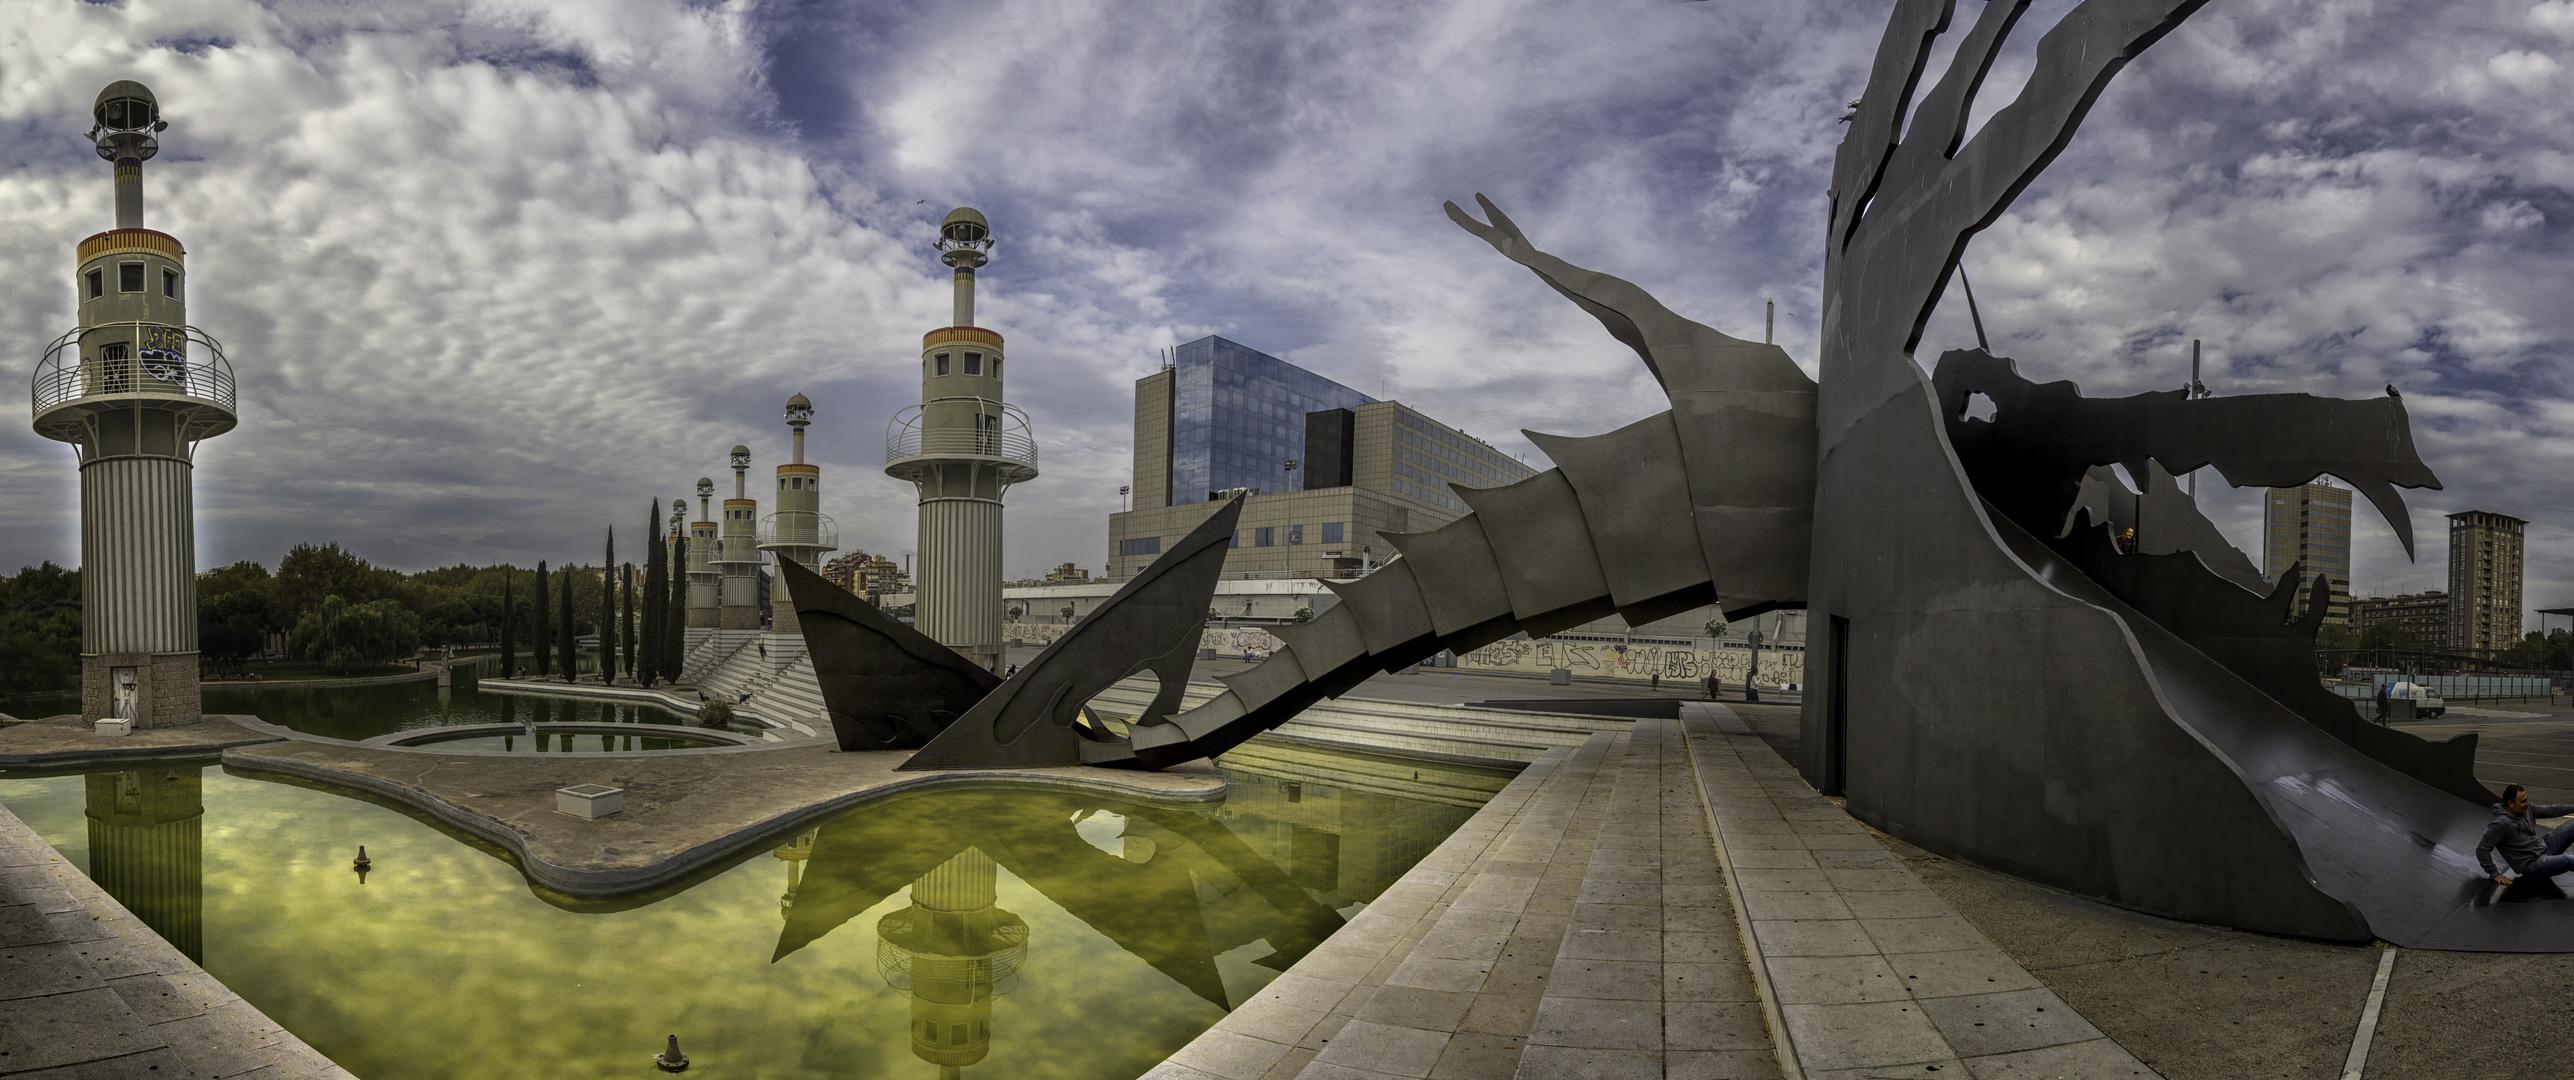 Plaza con tobogan. Panorámica